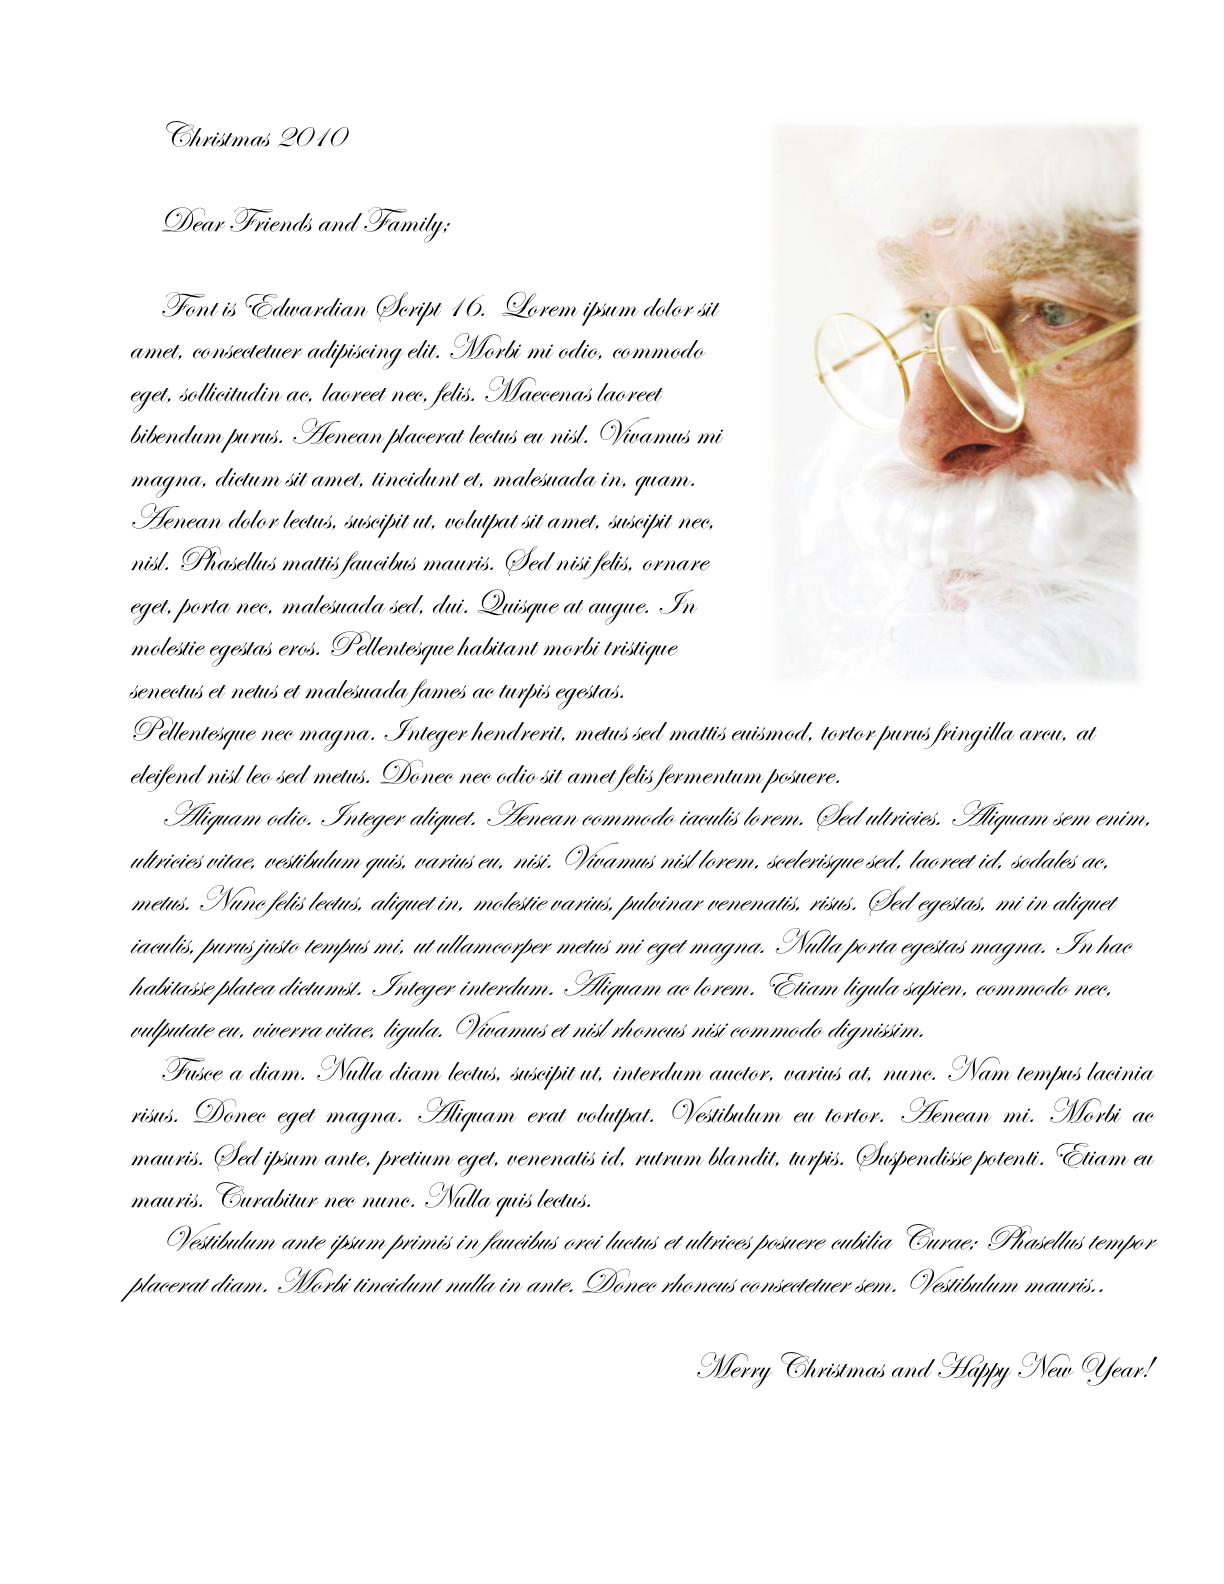 DoMyChristmasLetterForMe.blogspot.com: Christmas Letter Sample Ideas